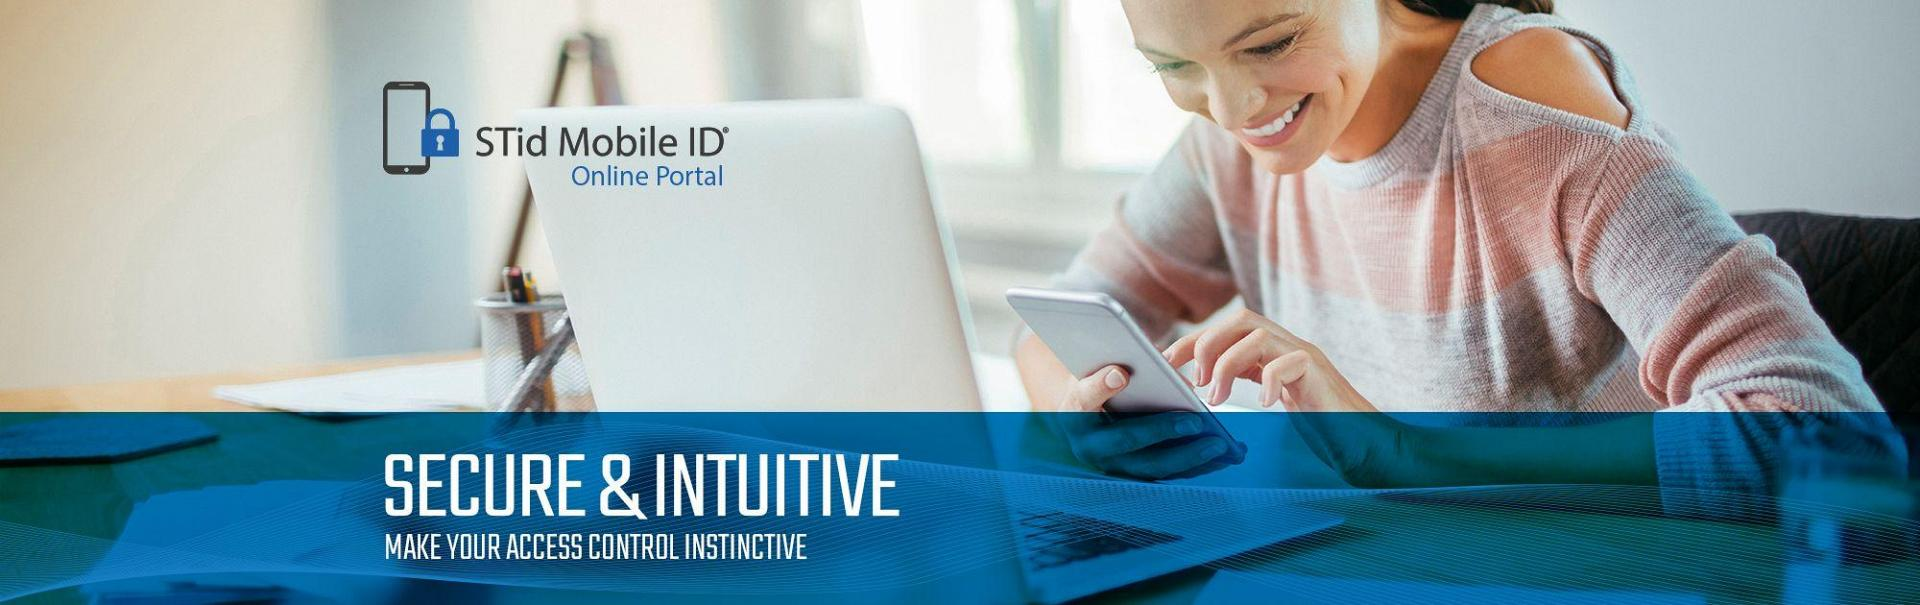 STid Mobile ID